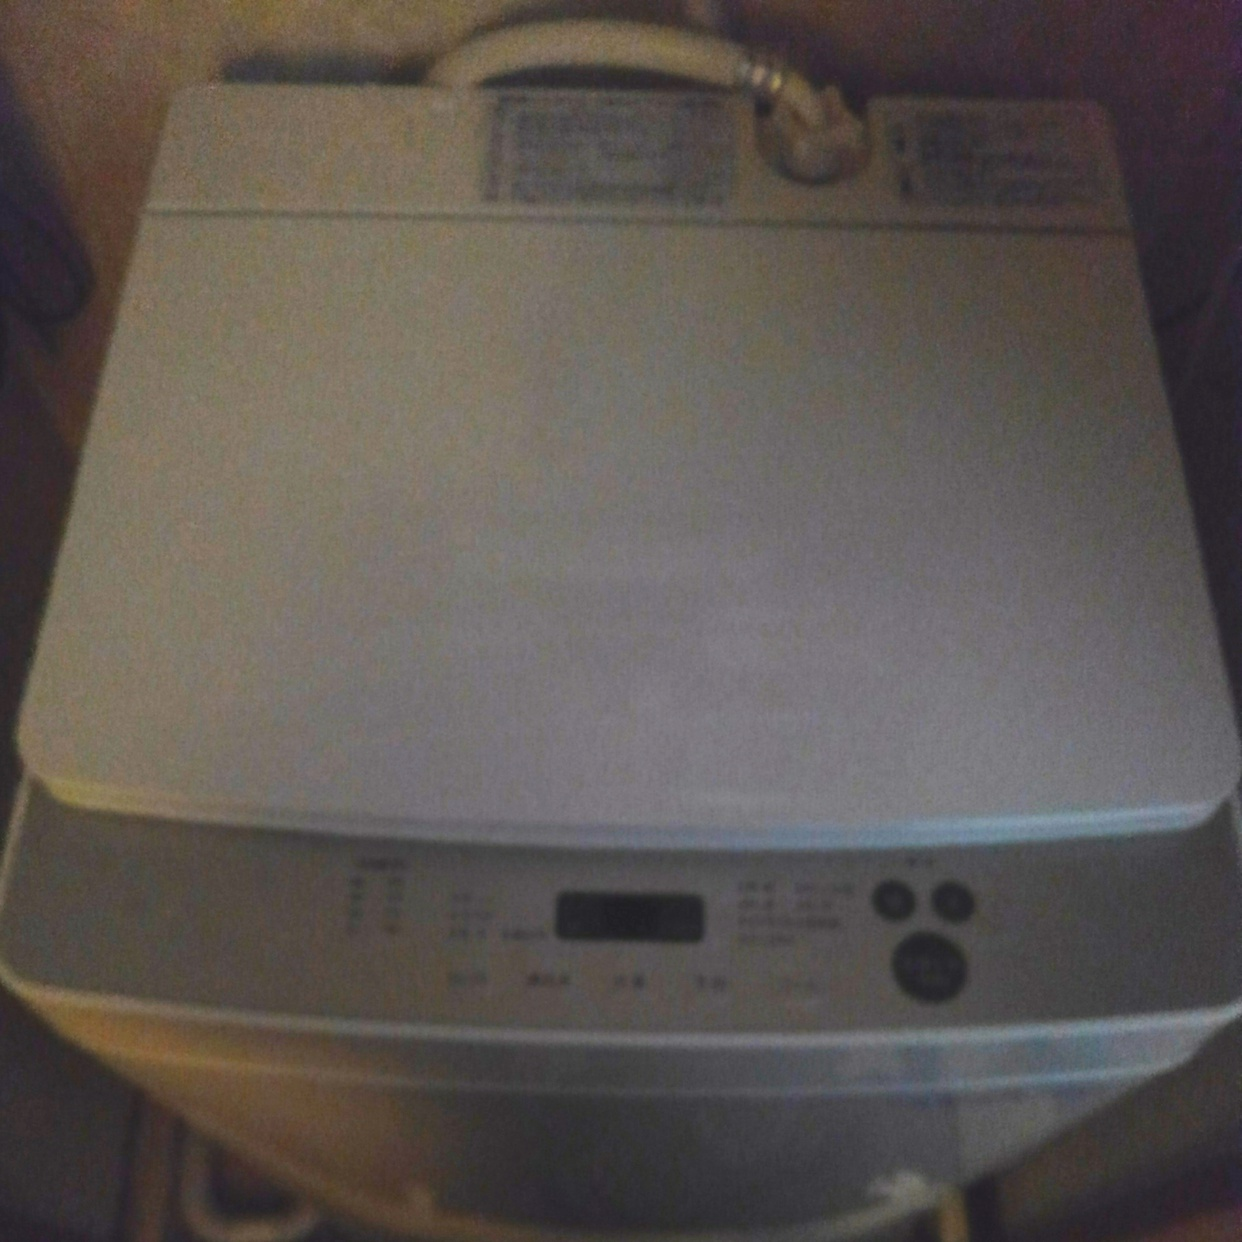 TWINBIRD(ツインバード)全自動洗濯機 KWM-EC55Wを使ったバドママ*さんのクチコミ画像1